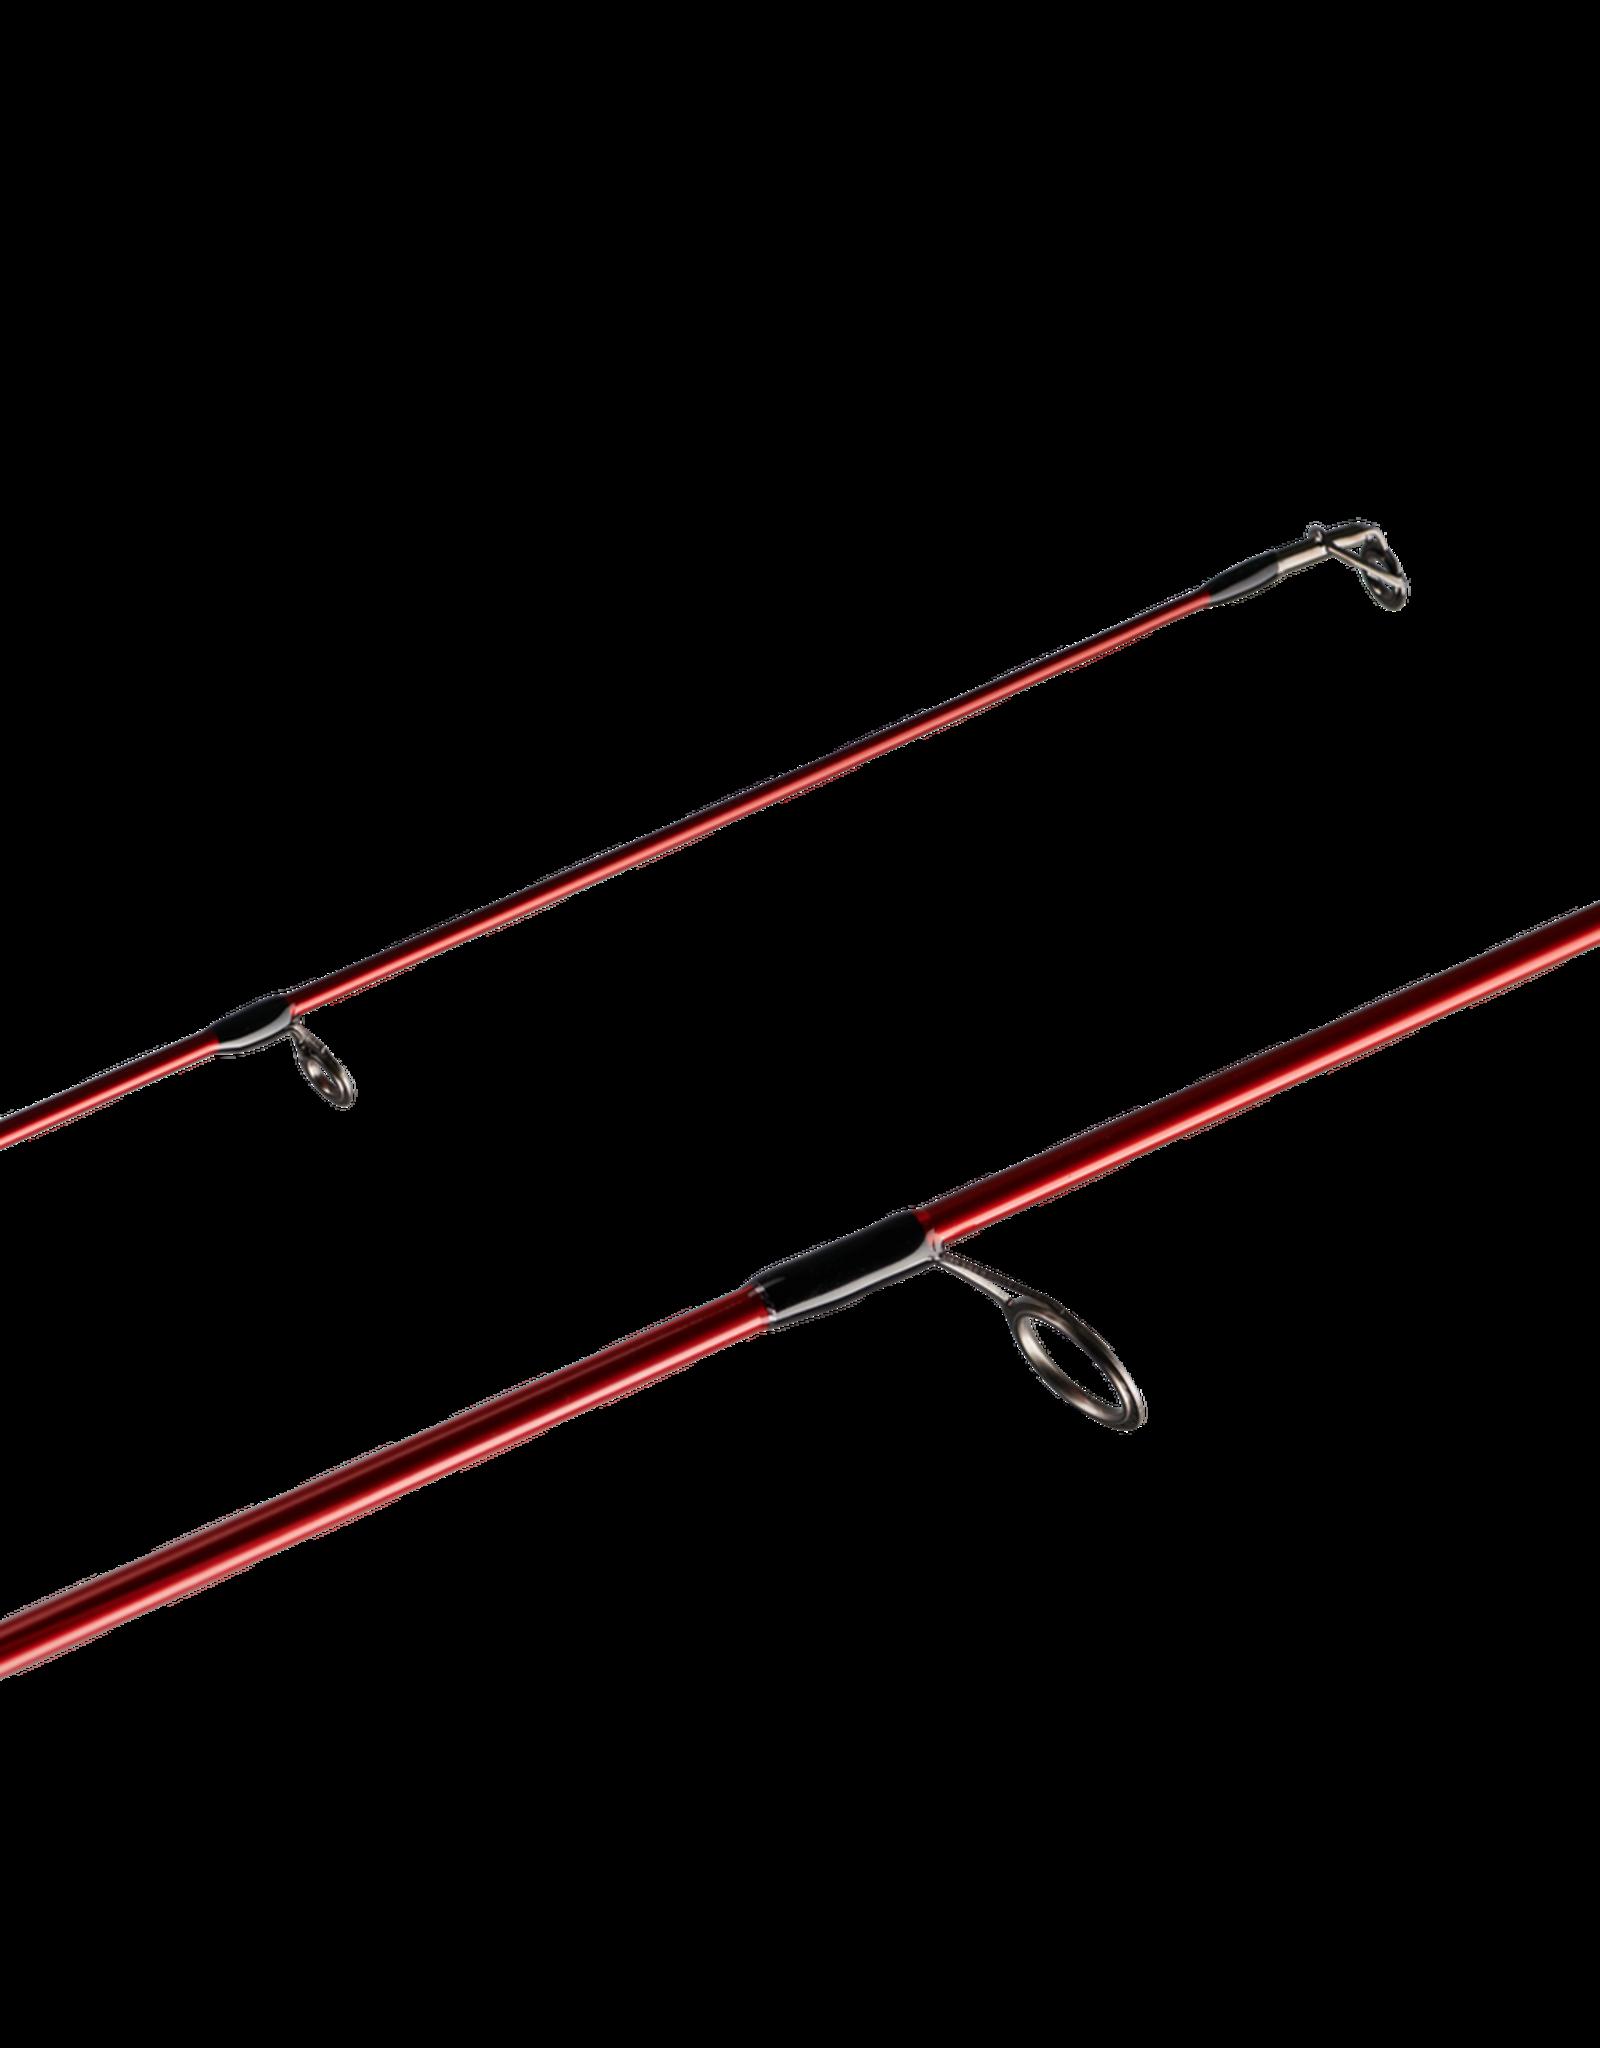 Berkley Berkley Cherrywood Spinning Rod